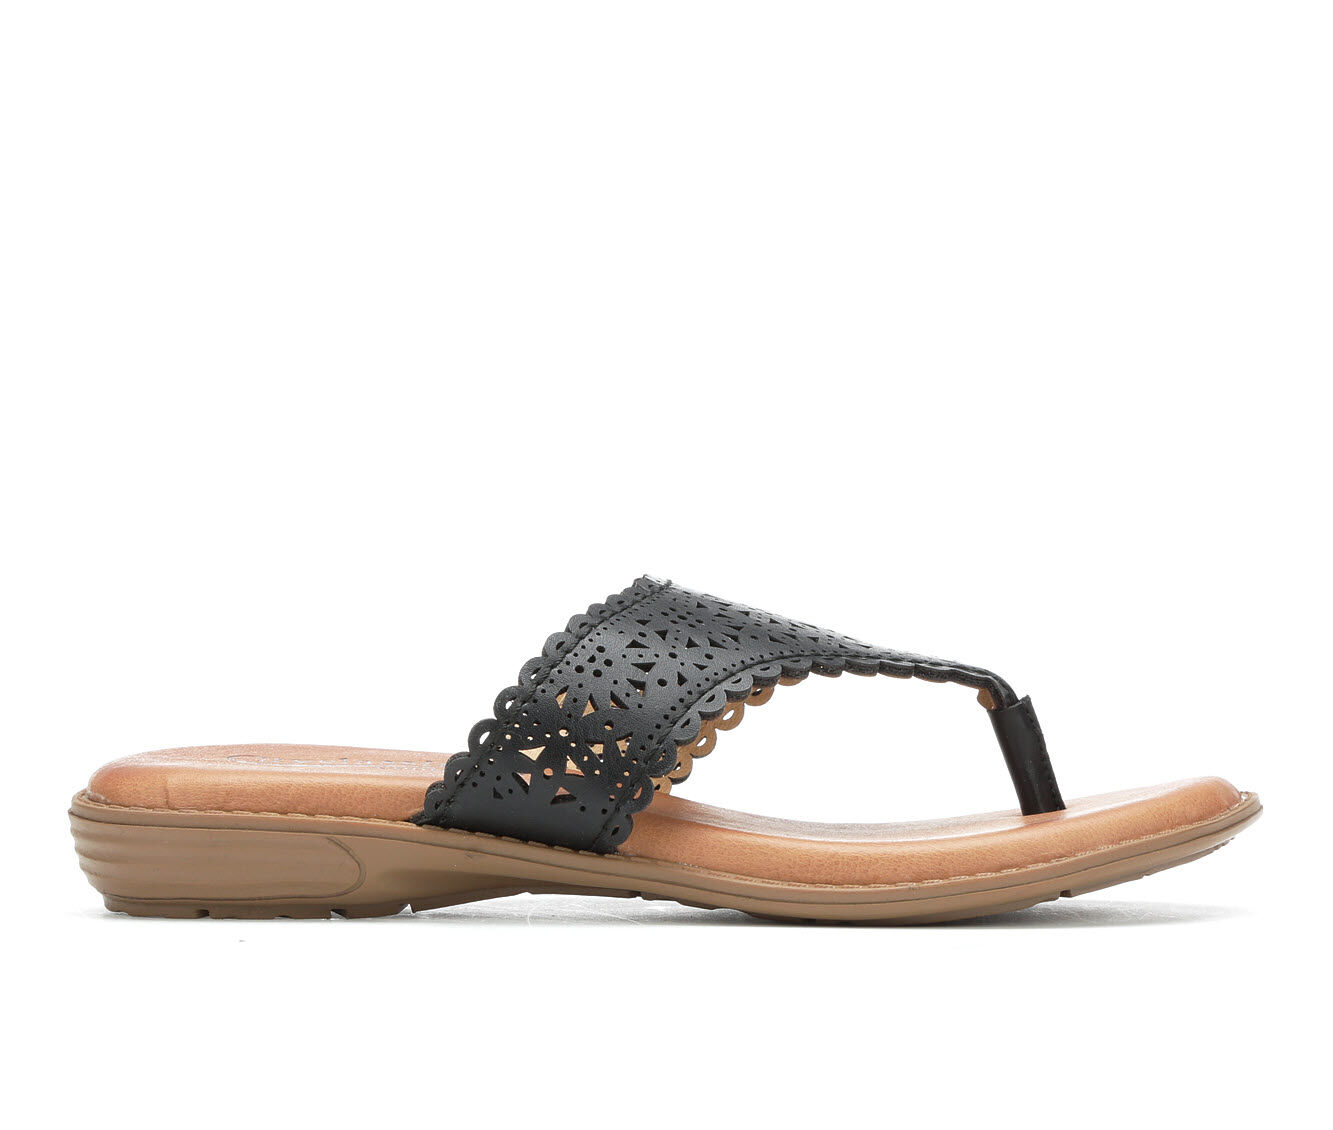 UK Sale Women's City Classified Quirk Sandals Black